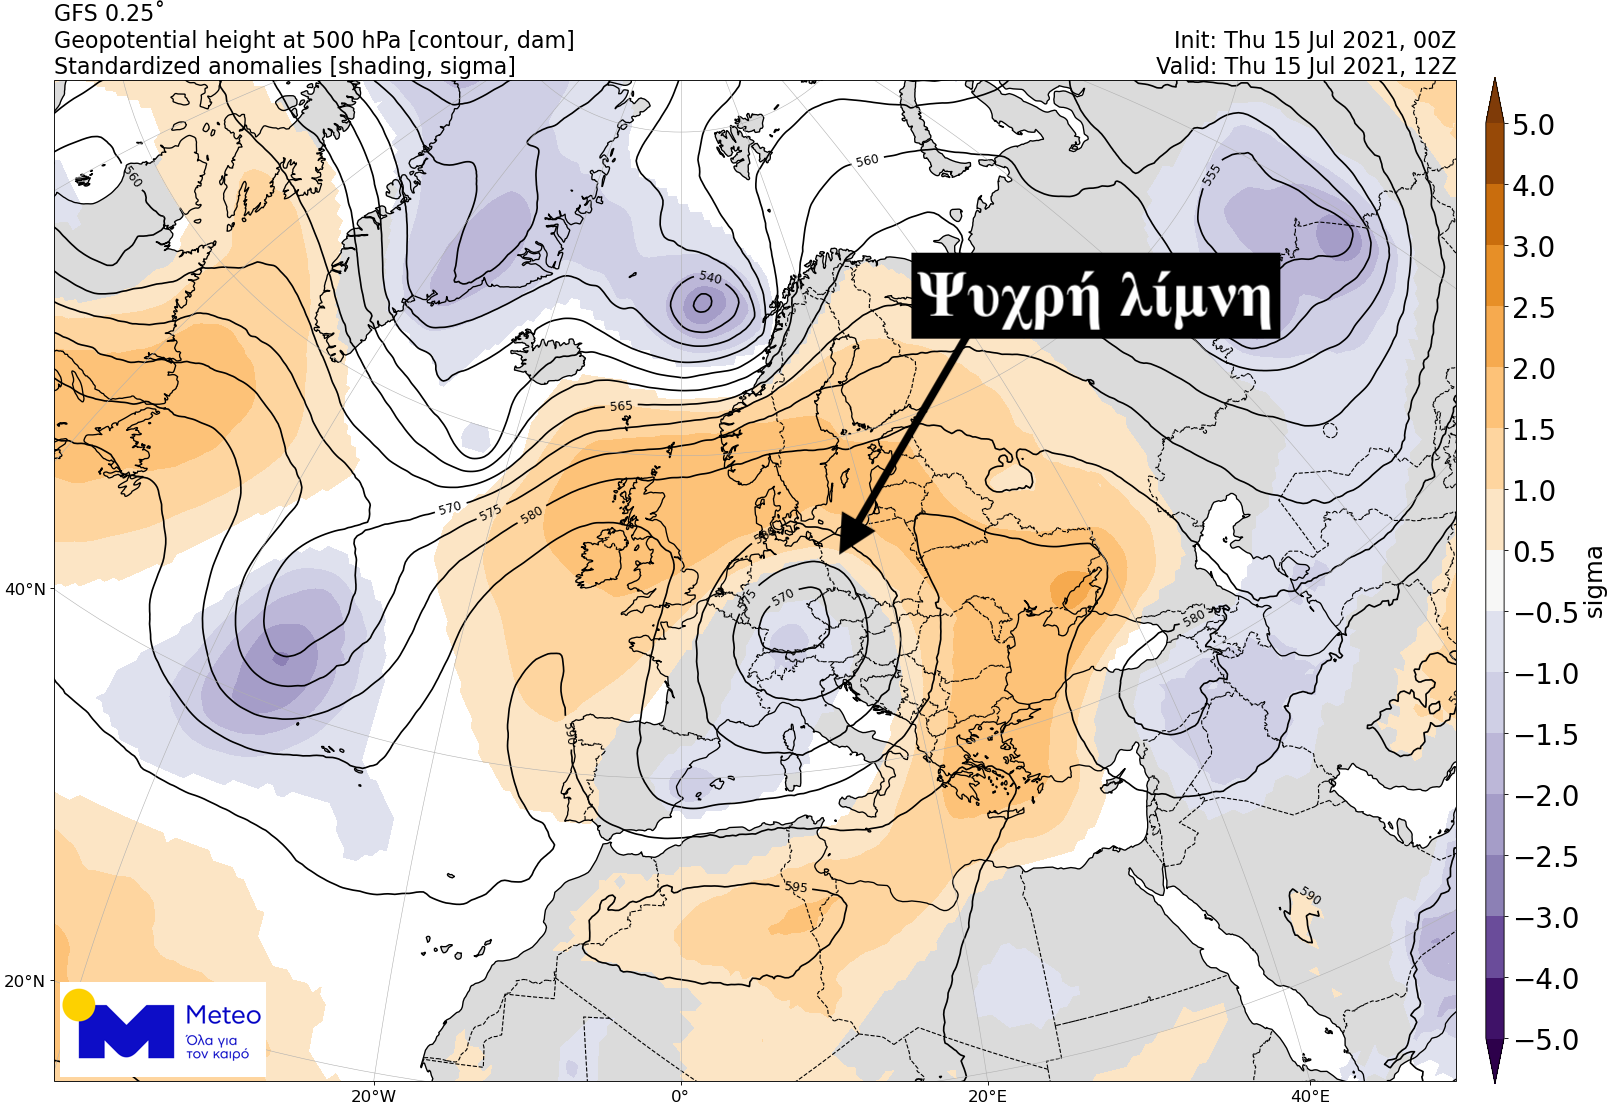 https://www.meteo.gr/UploadedFiles/articlePhotos/JUL21/ARCHIVE_GFS_025_EU_PANEL_ft_12_f.png